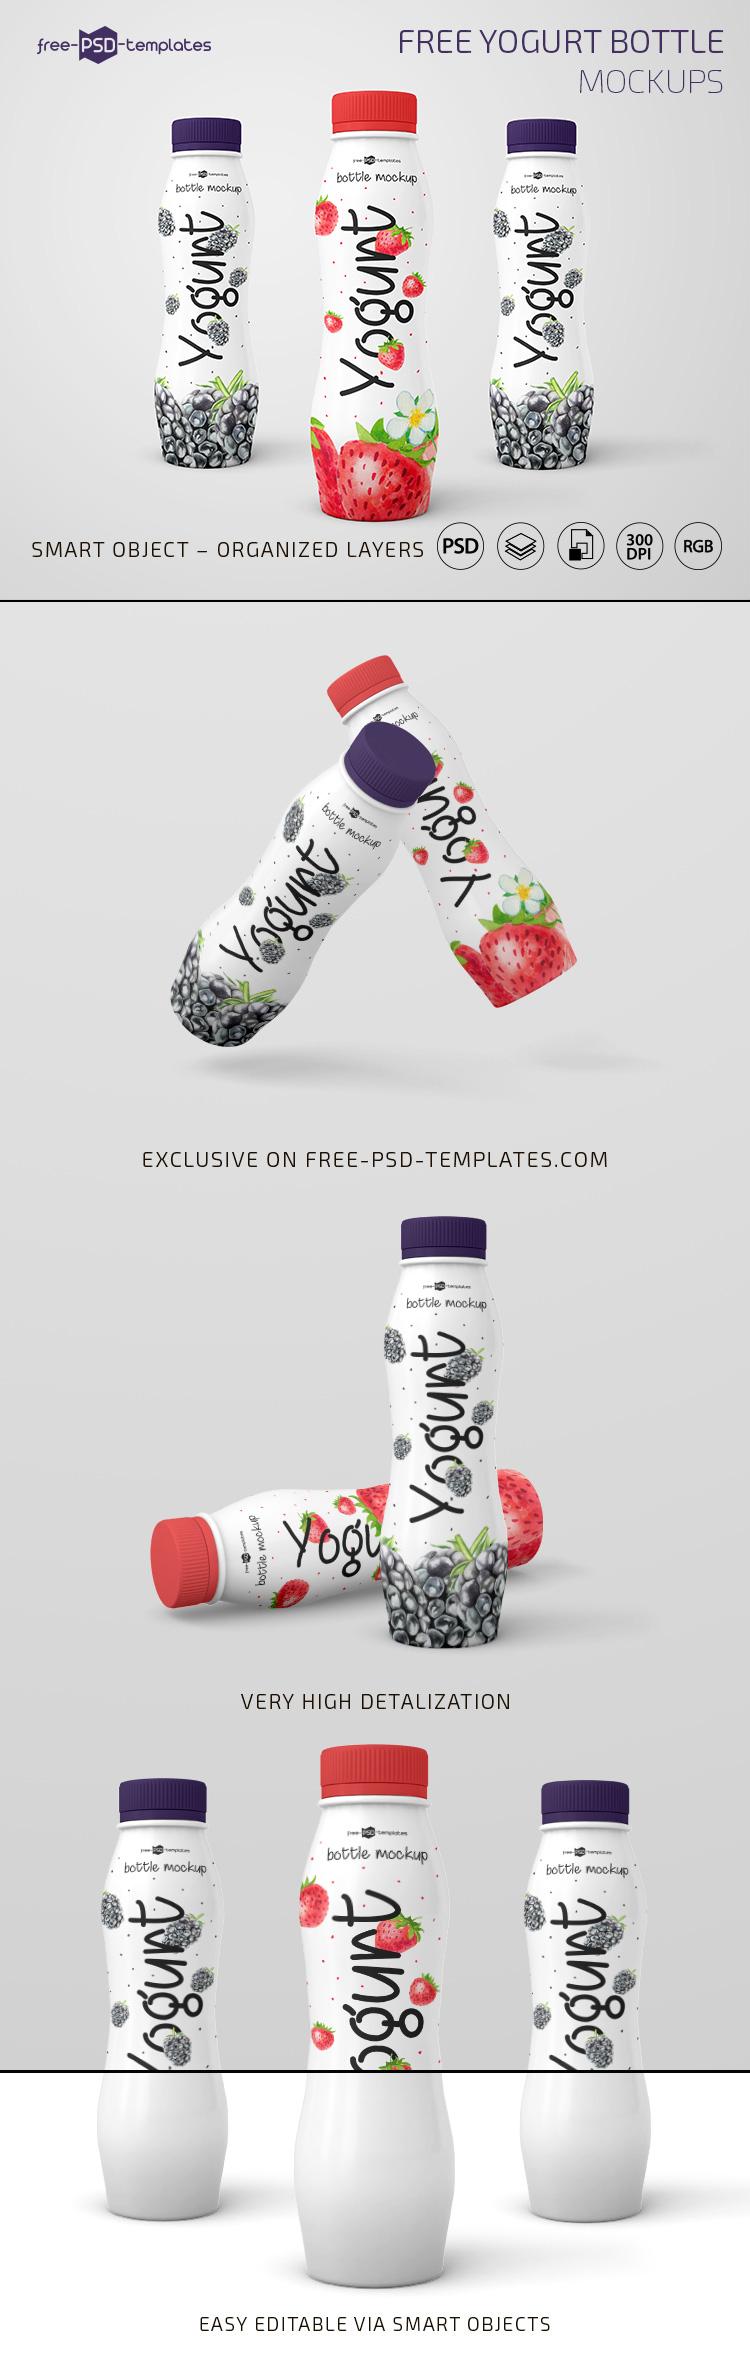 3 Free Photo-Realistic Yogurt Bottle Mockups